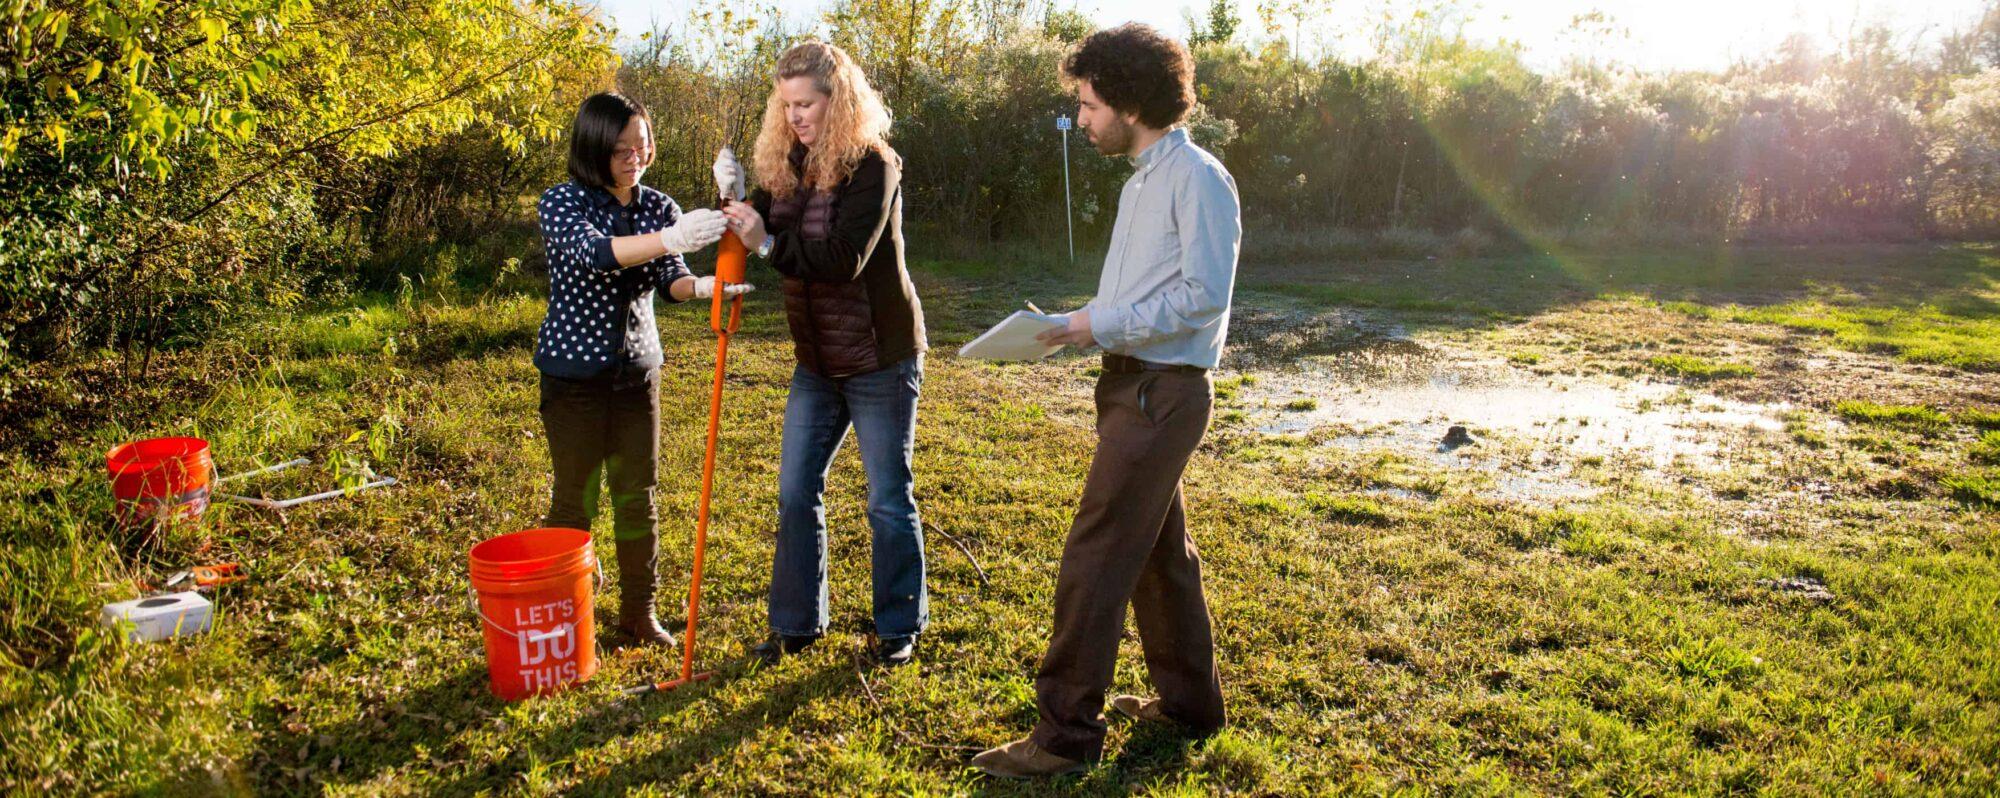 Environmental science studens working in field